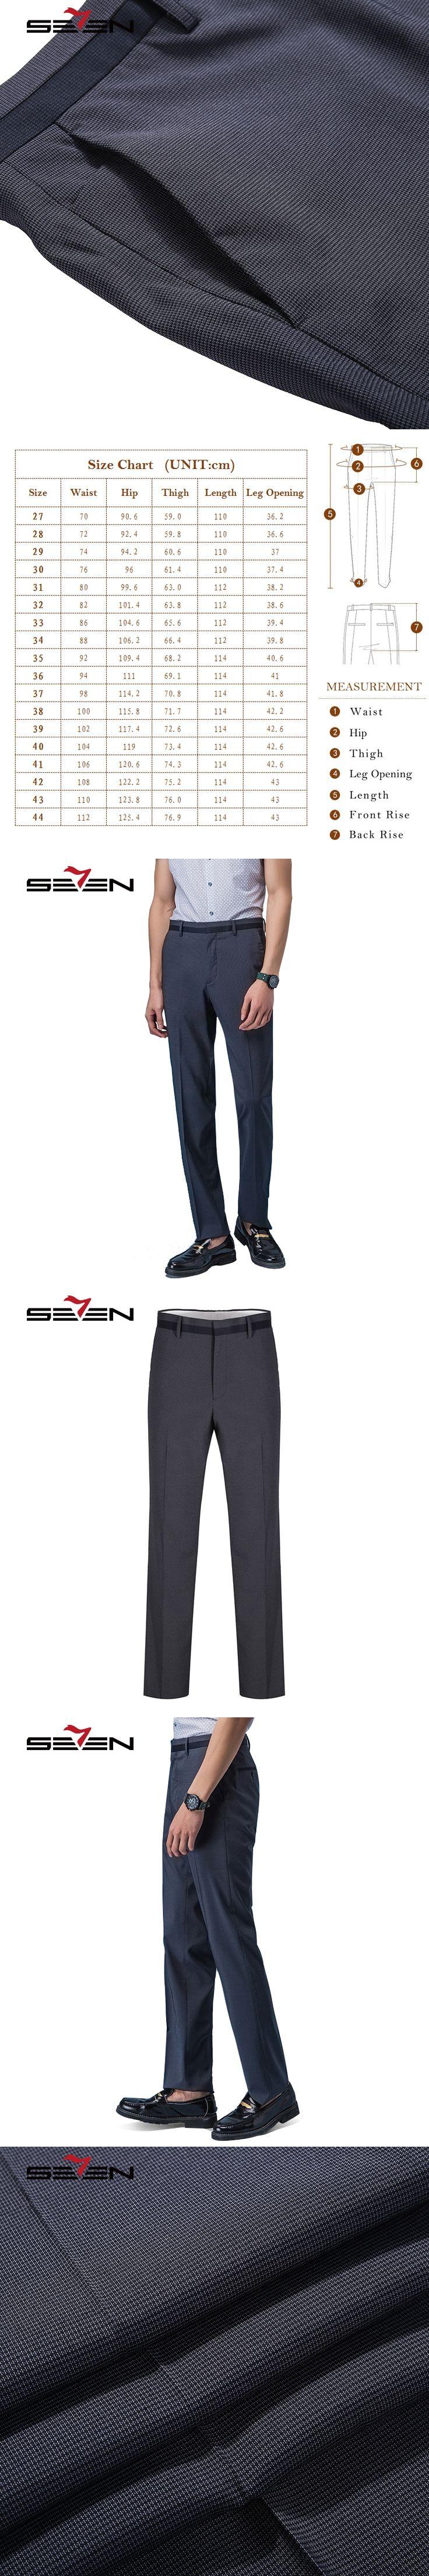 Seven7 2017 New Spring Autumn Fashion Slim Fit Men Casual Dress Pants Straight Men Business Trousers Skinny Suit Pants 708B77201